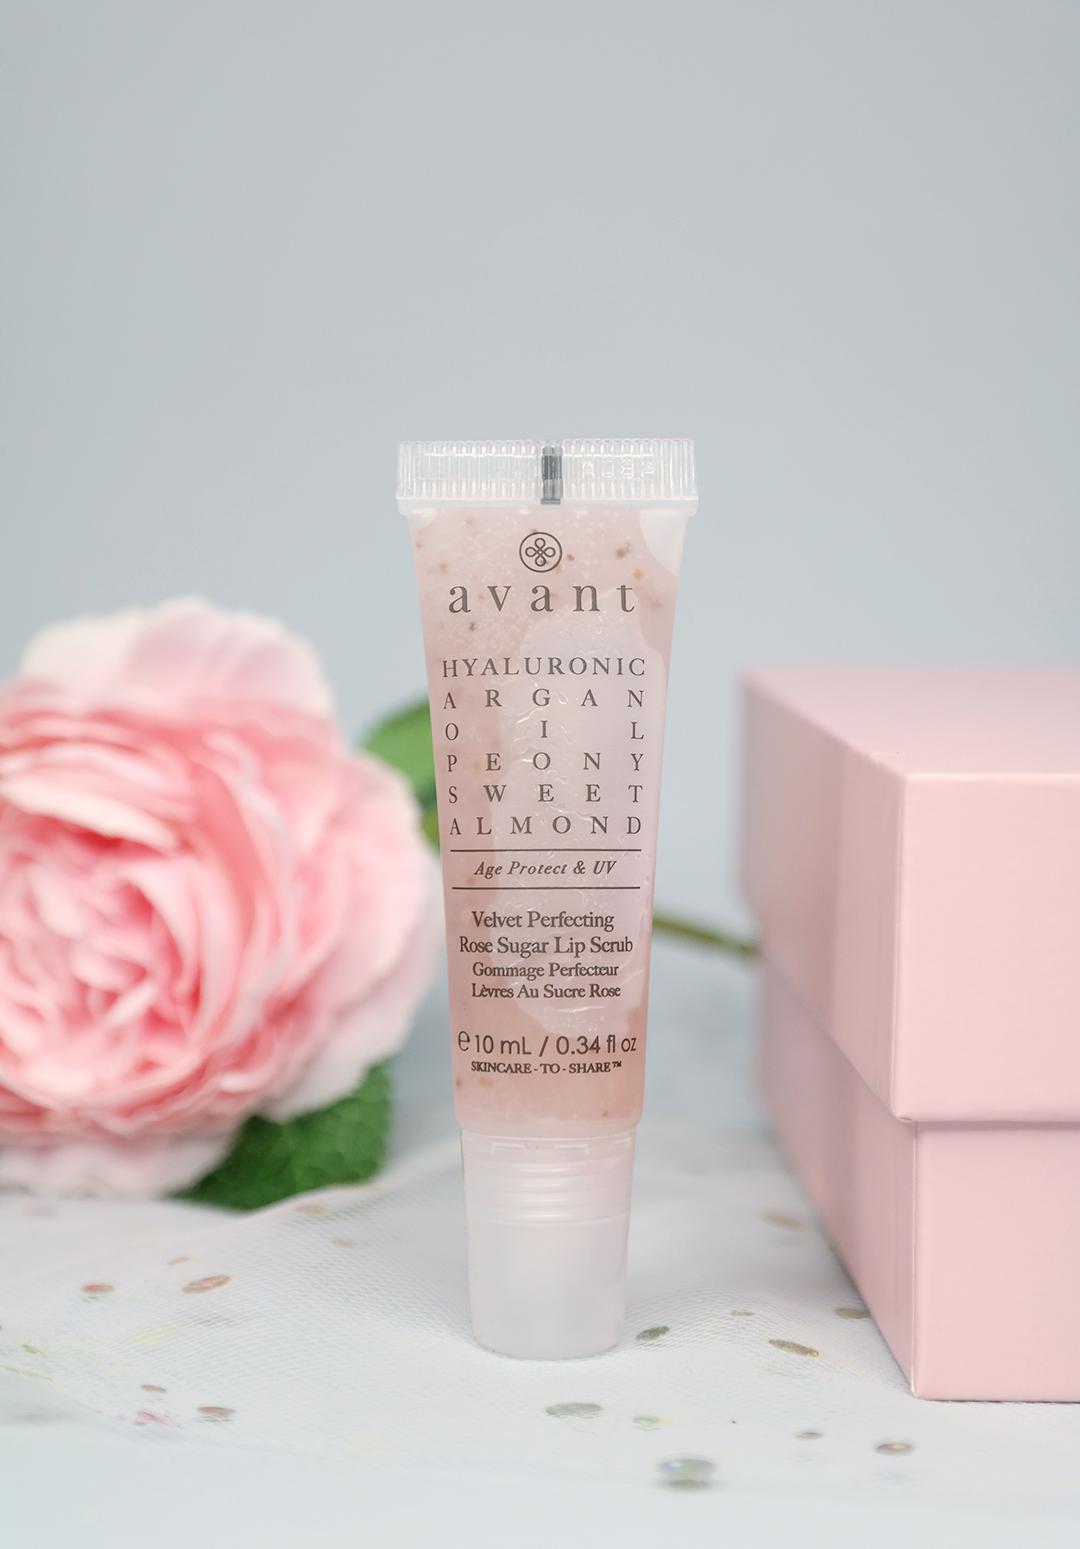 Avant Velvet Perfecting Rose Sugar Lip Scrub